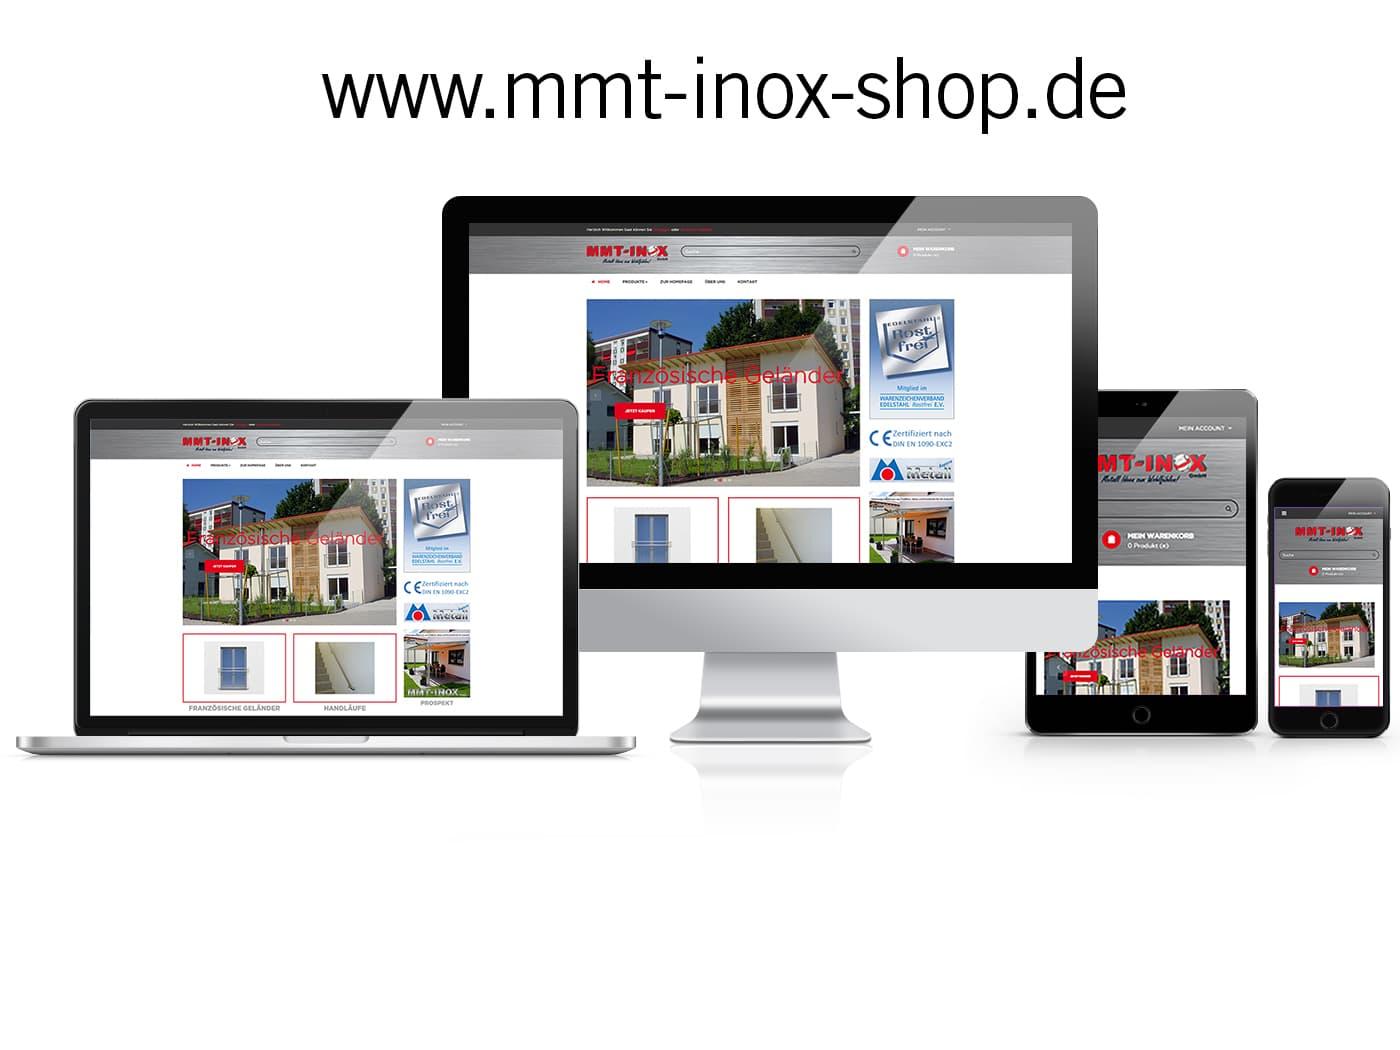 Prestashop Online-Shop MMT Inox GmbH